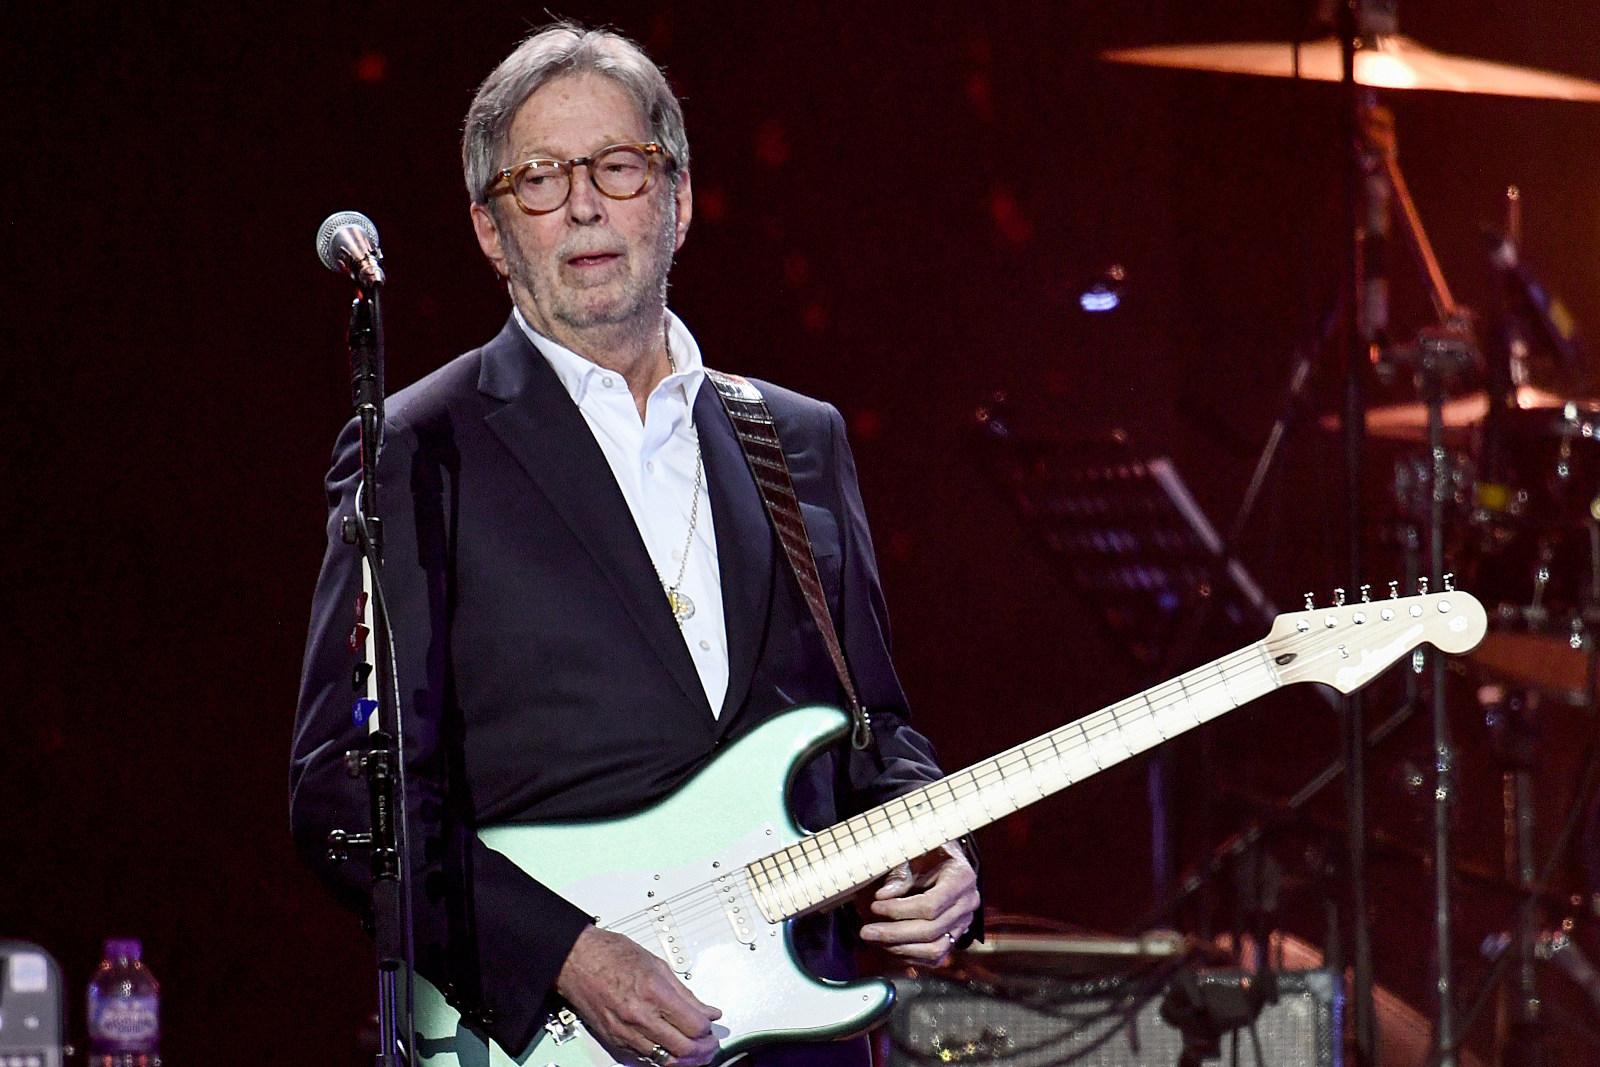 Eric Clapton Details 'Severe Reactions' to AstraZeneca Vaccine